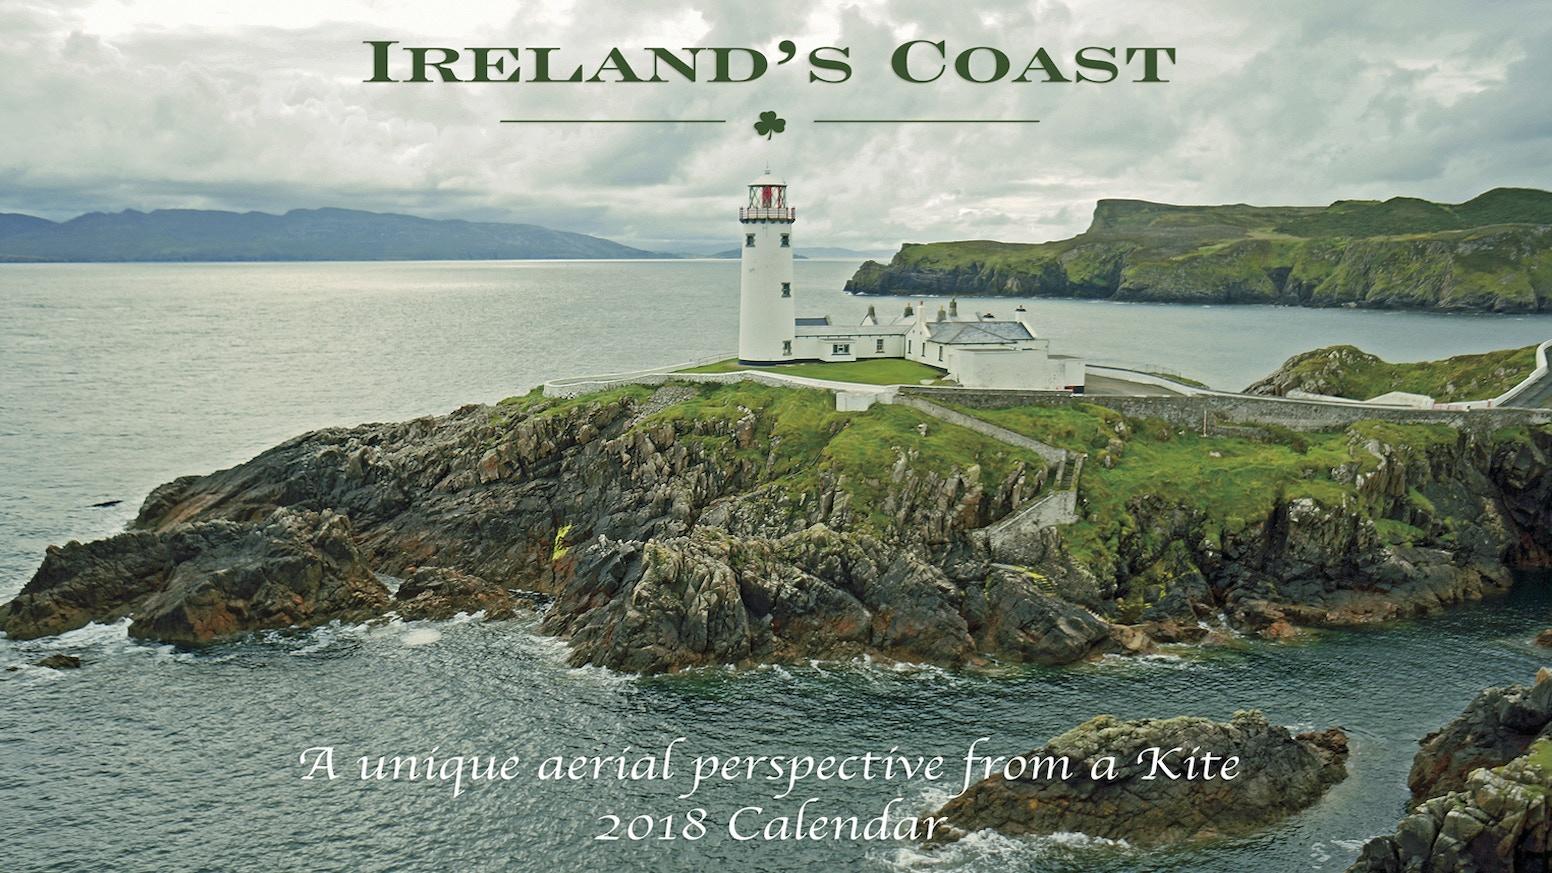 irelands coast from a kite calendar 2018